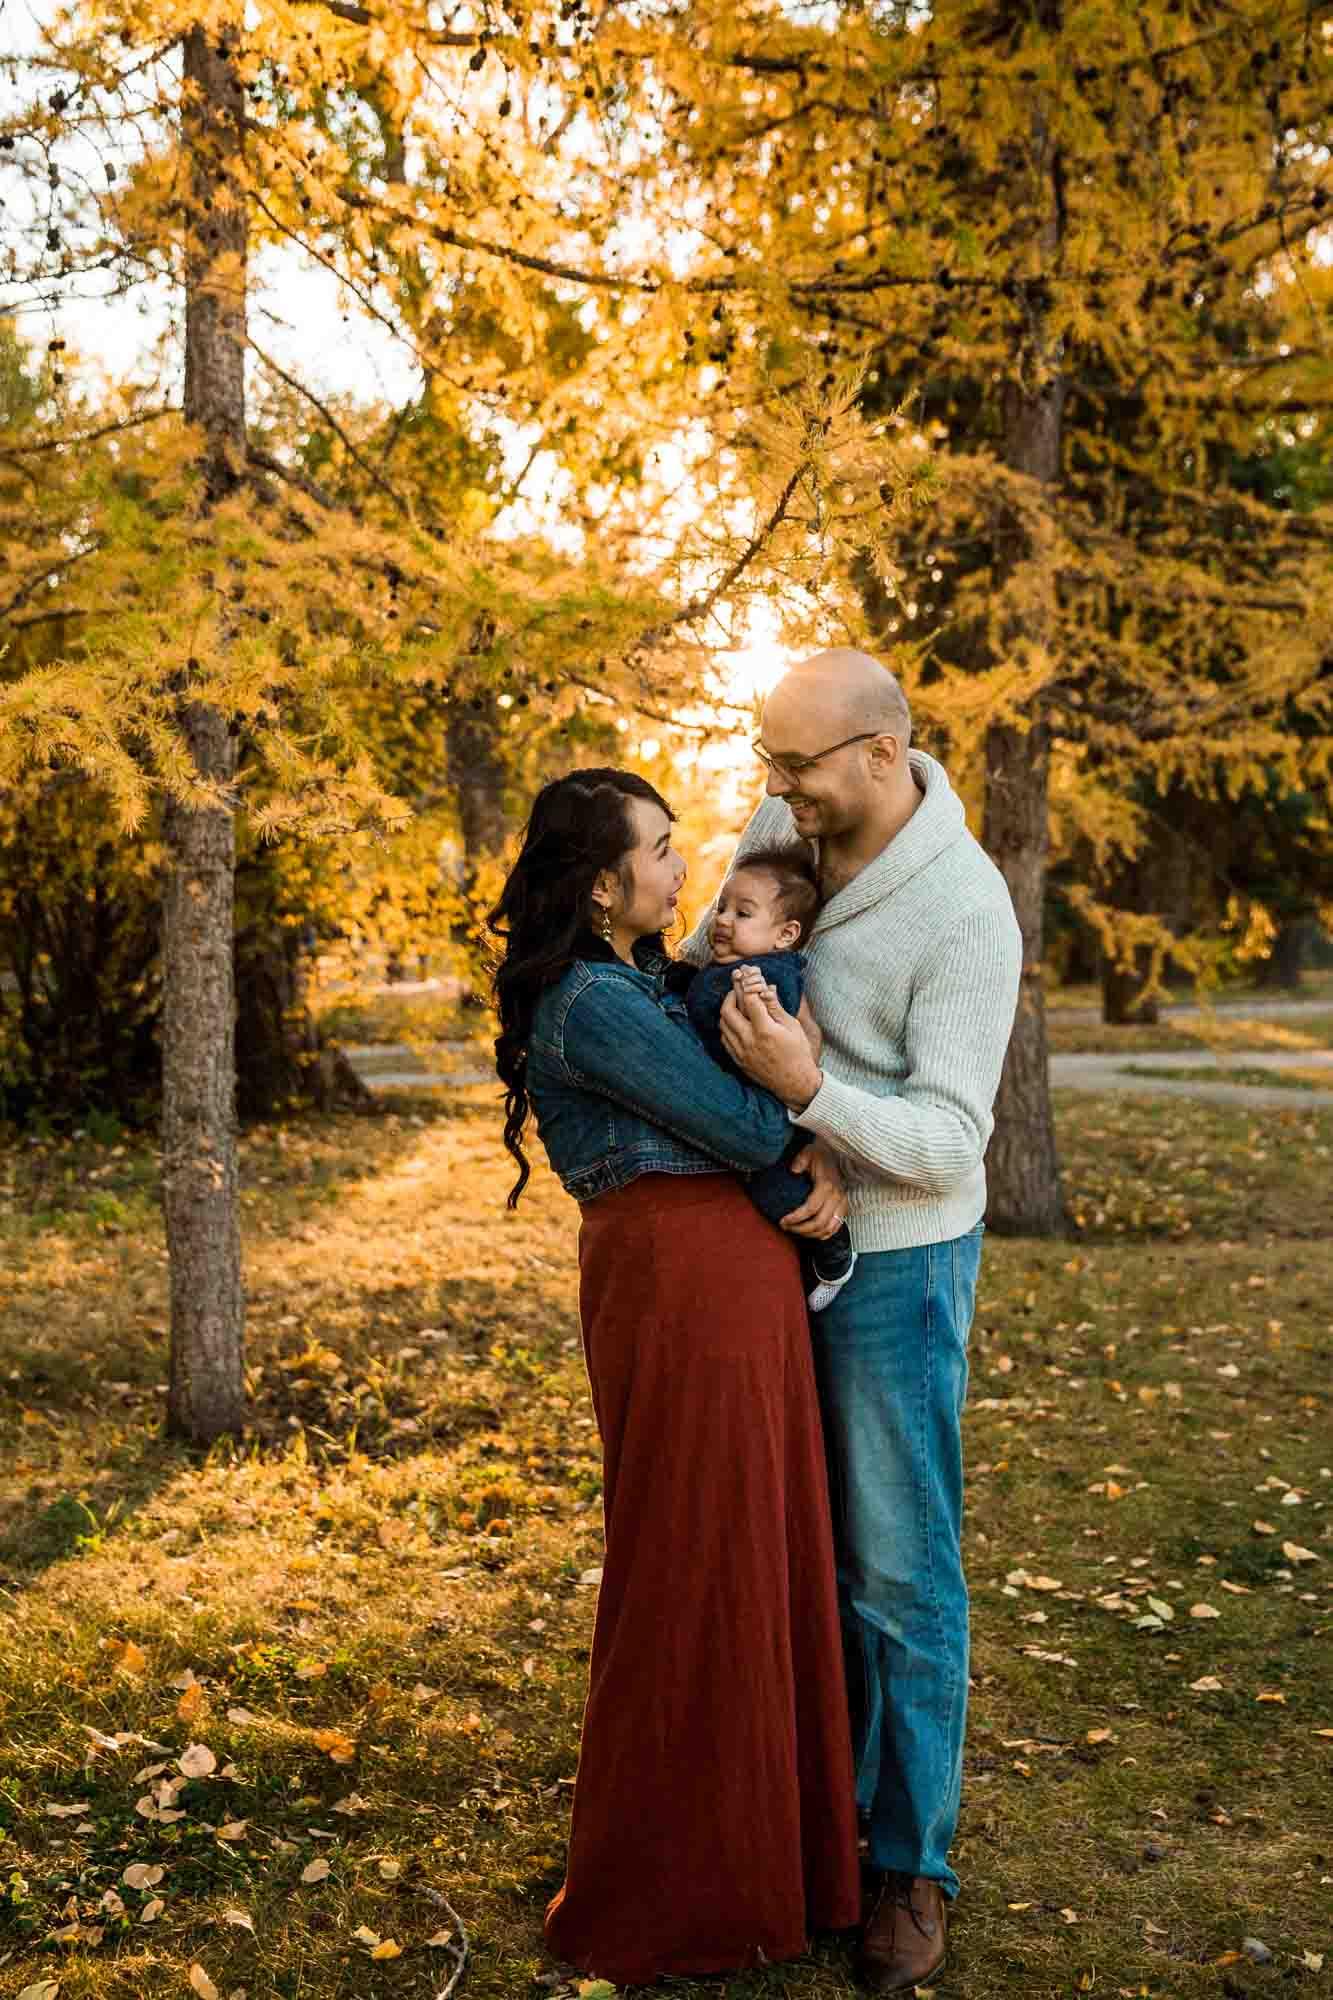 Calgary family, newborn and maternity photographer, fall family photos at Bowness Park